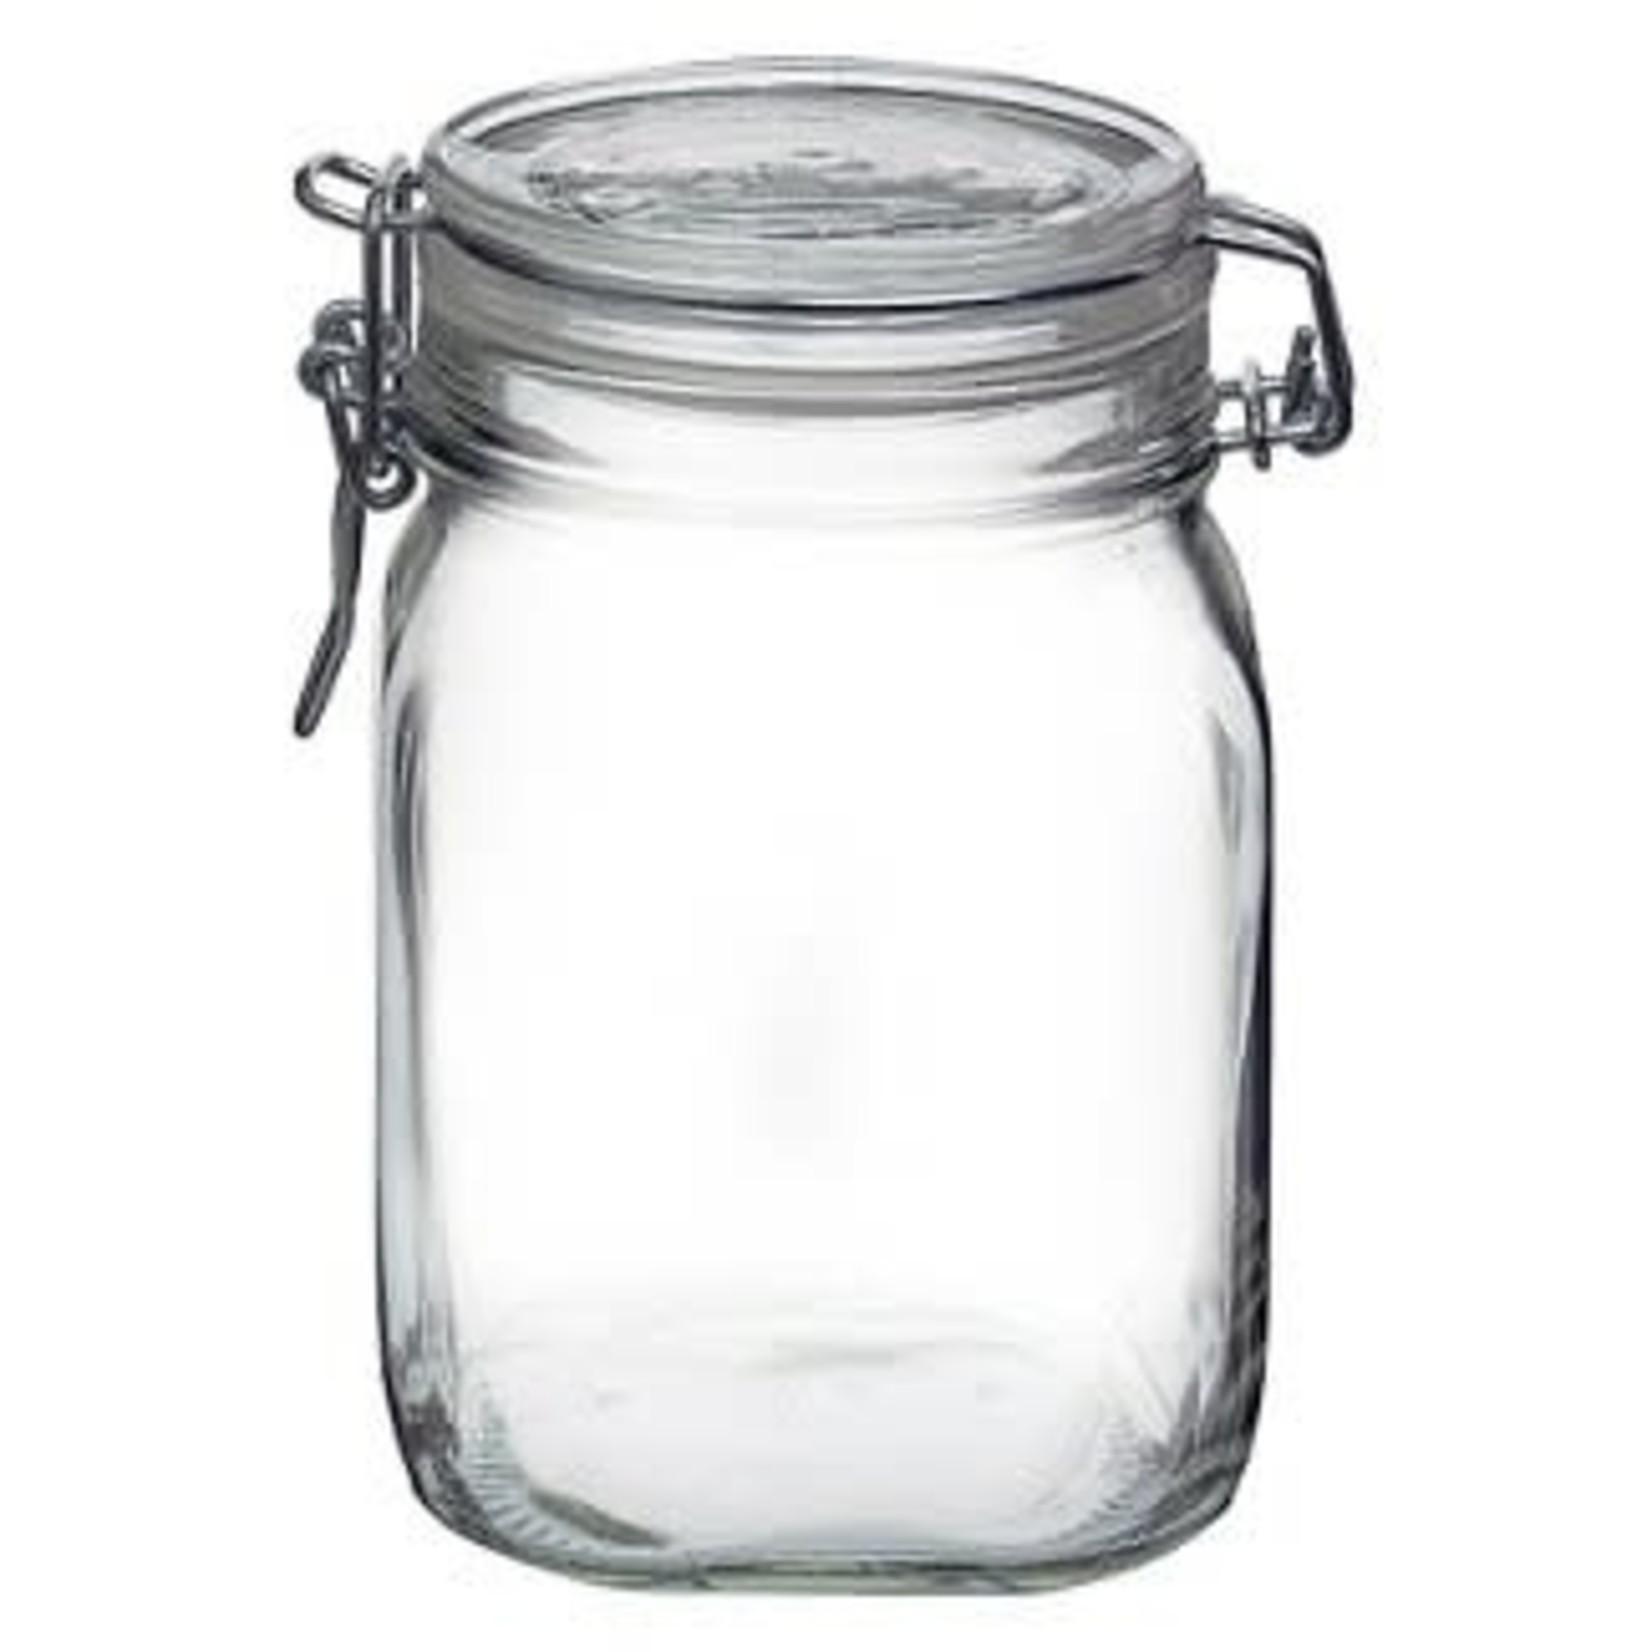 Bormioli Rocco Fido 1 Liter Clamp Jar